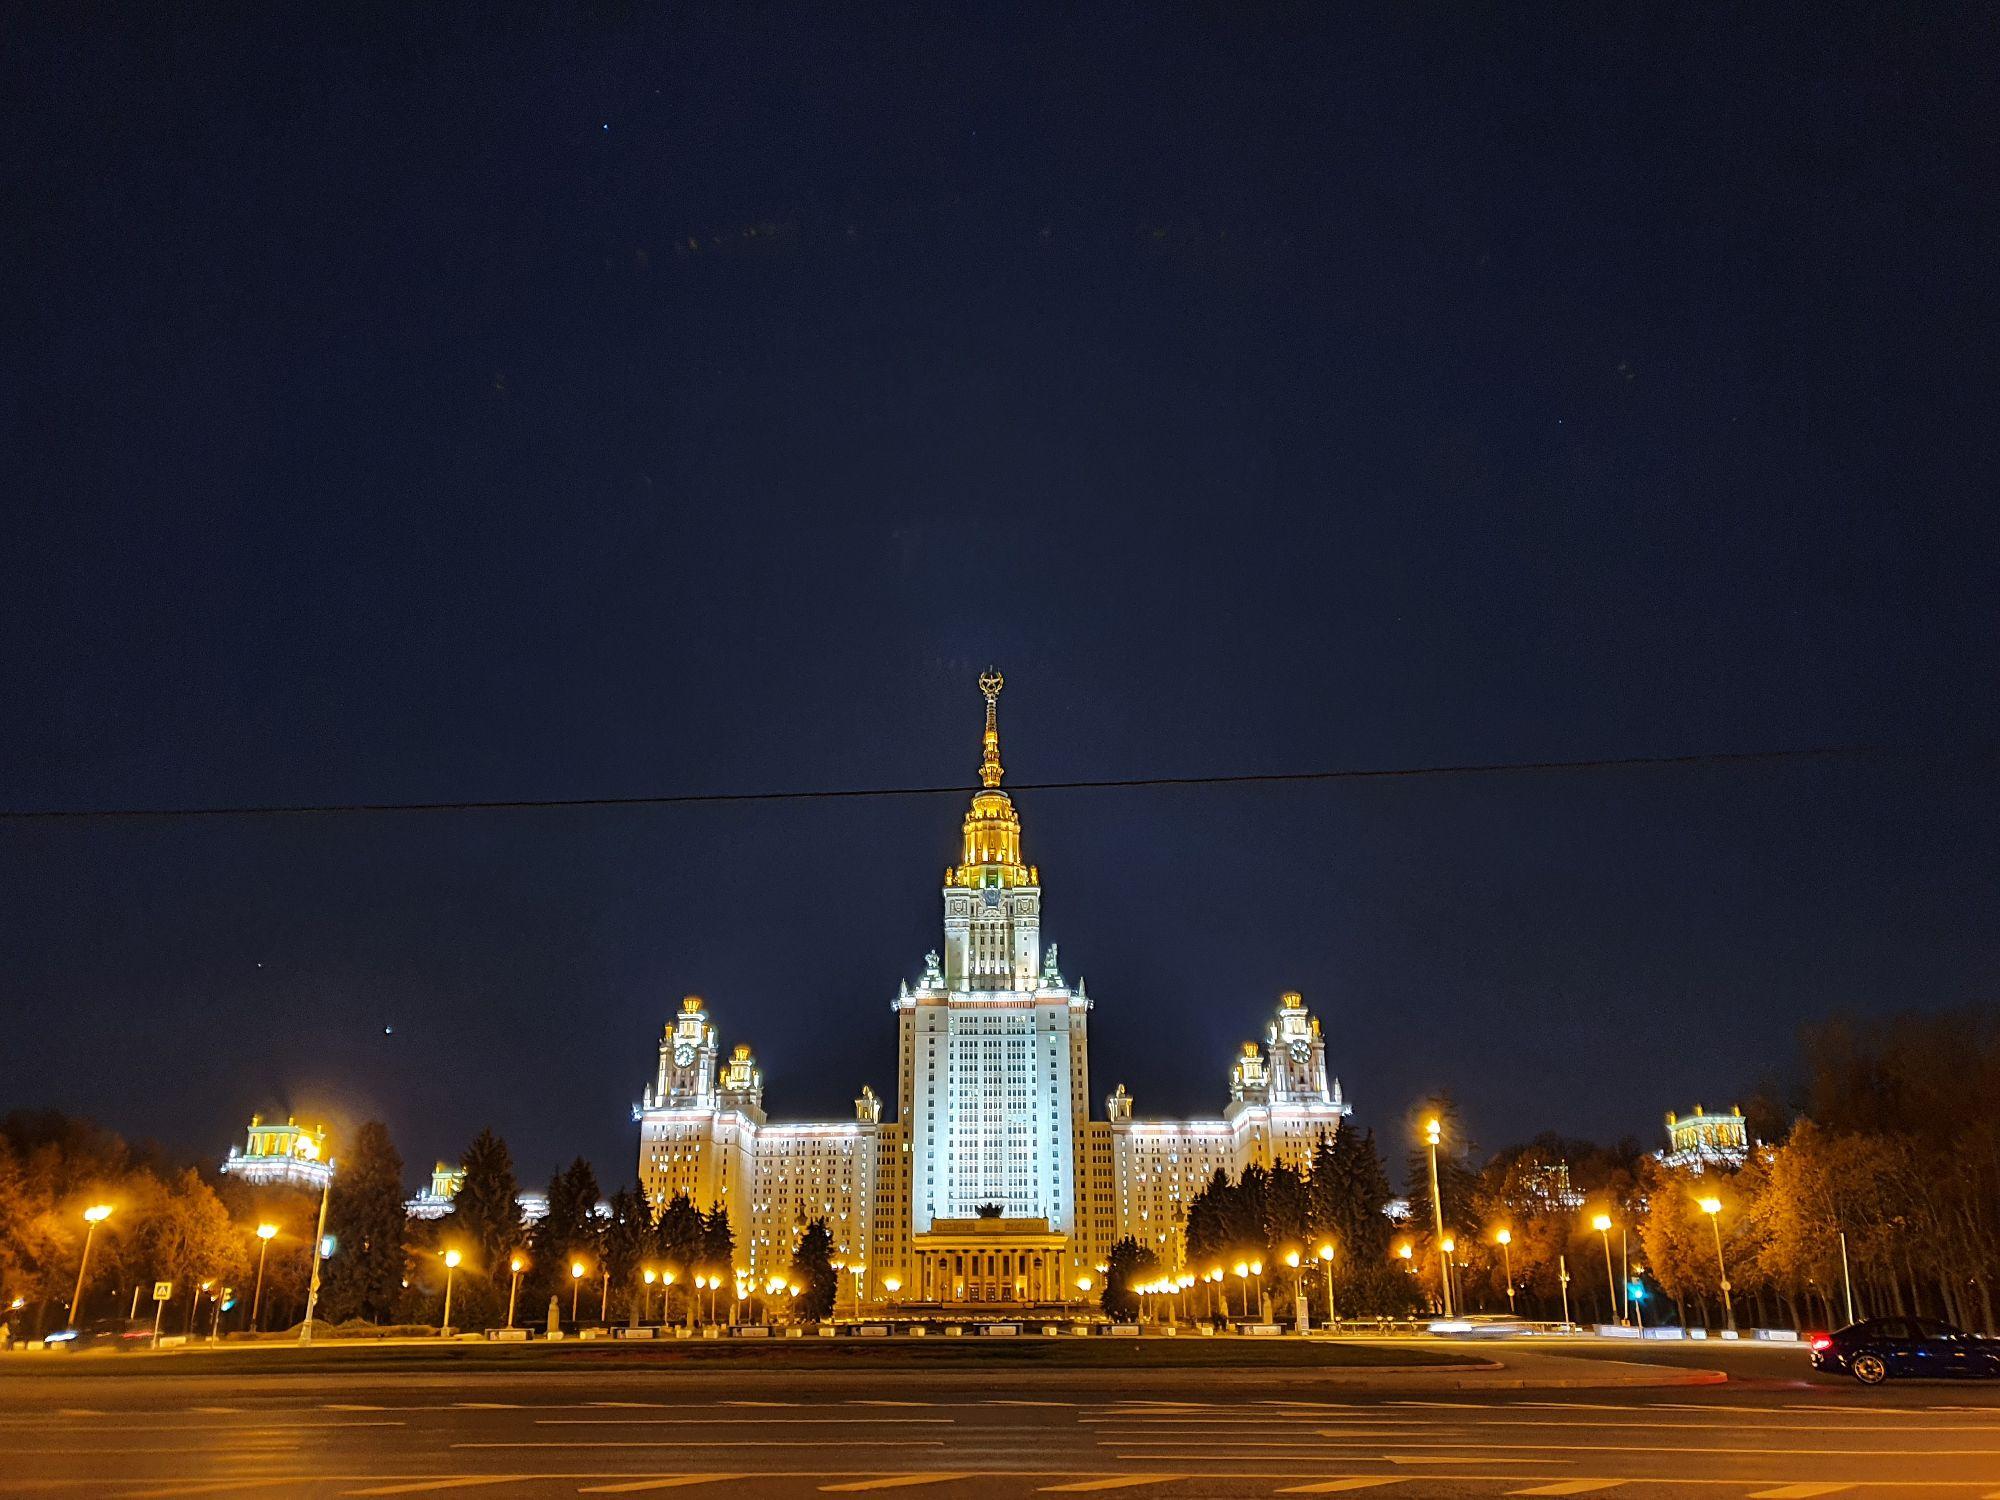 МГУ. Ноябрь 2020